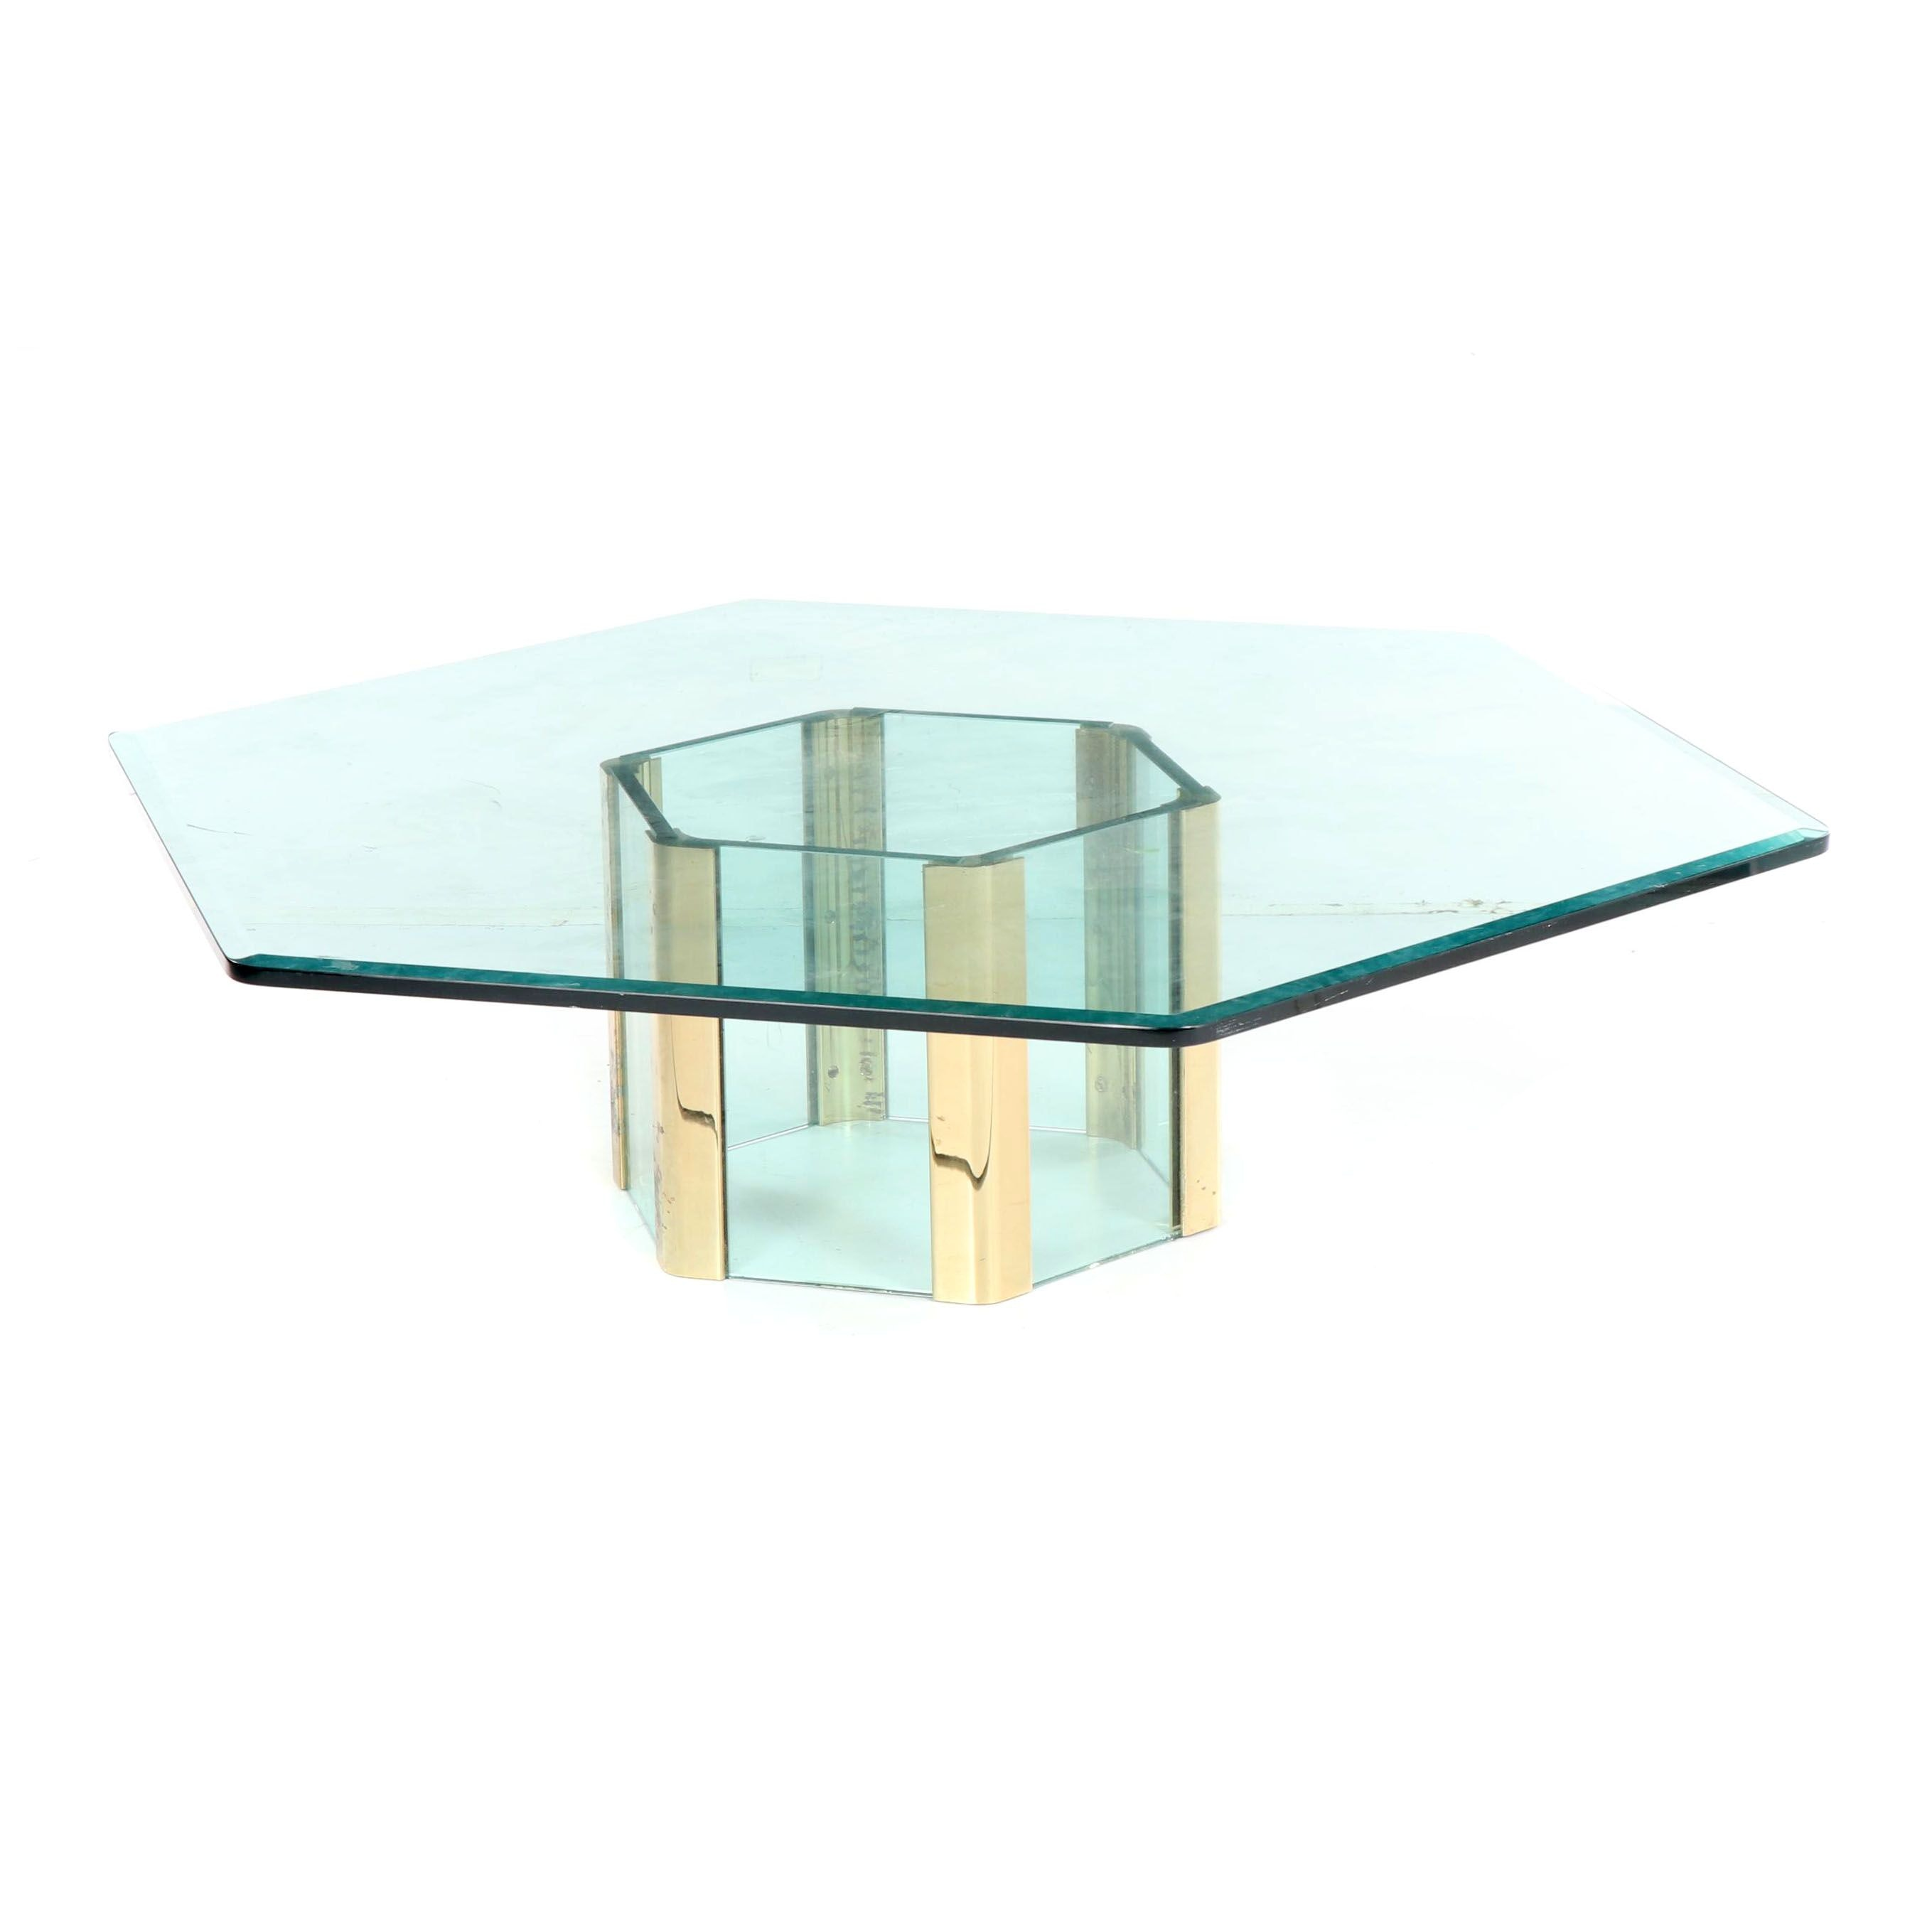 Hexagonal Glass and Metal Coffee Table, 20th Century